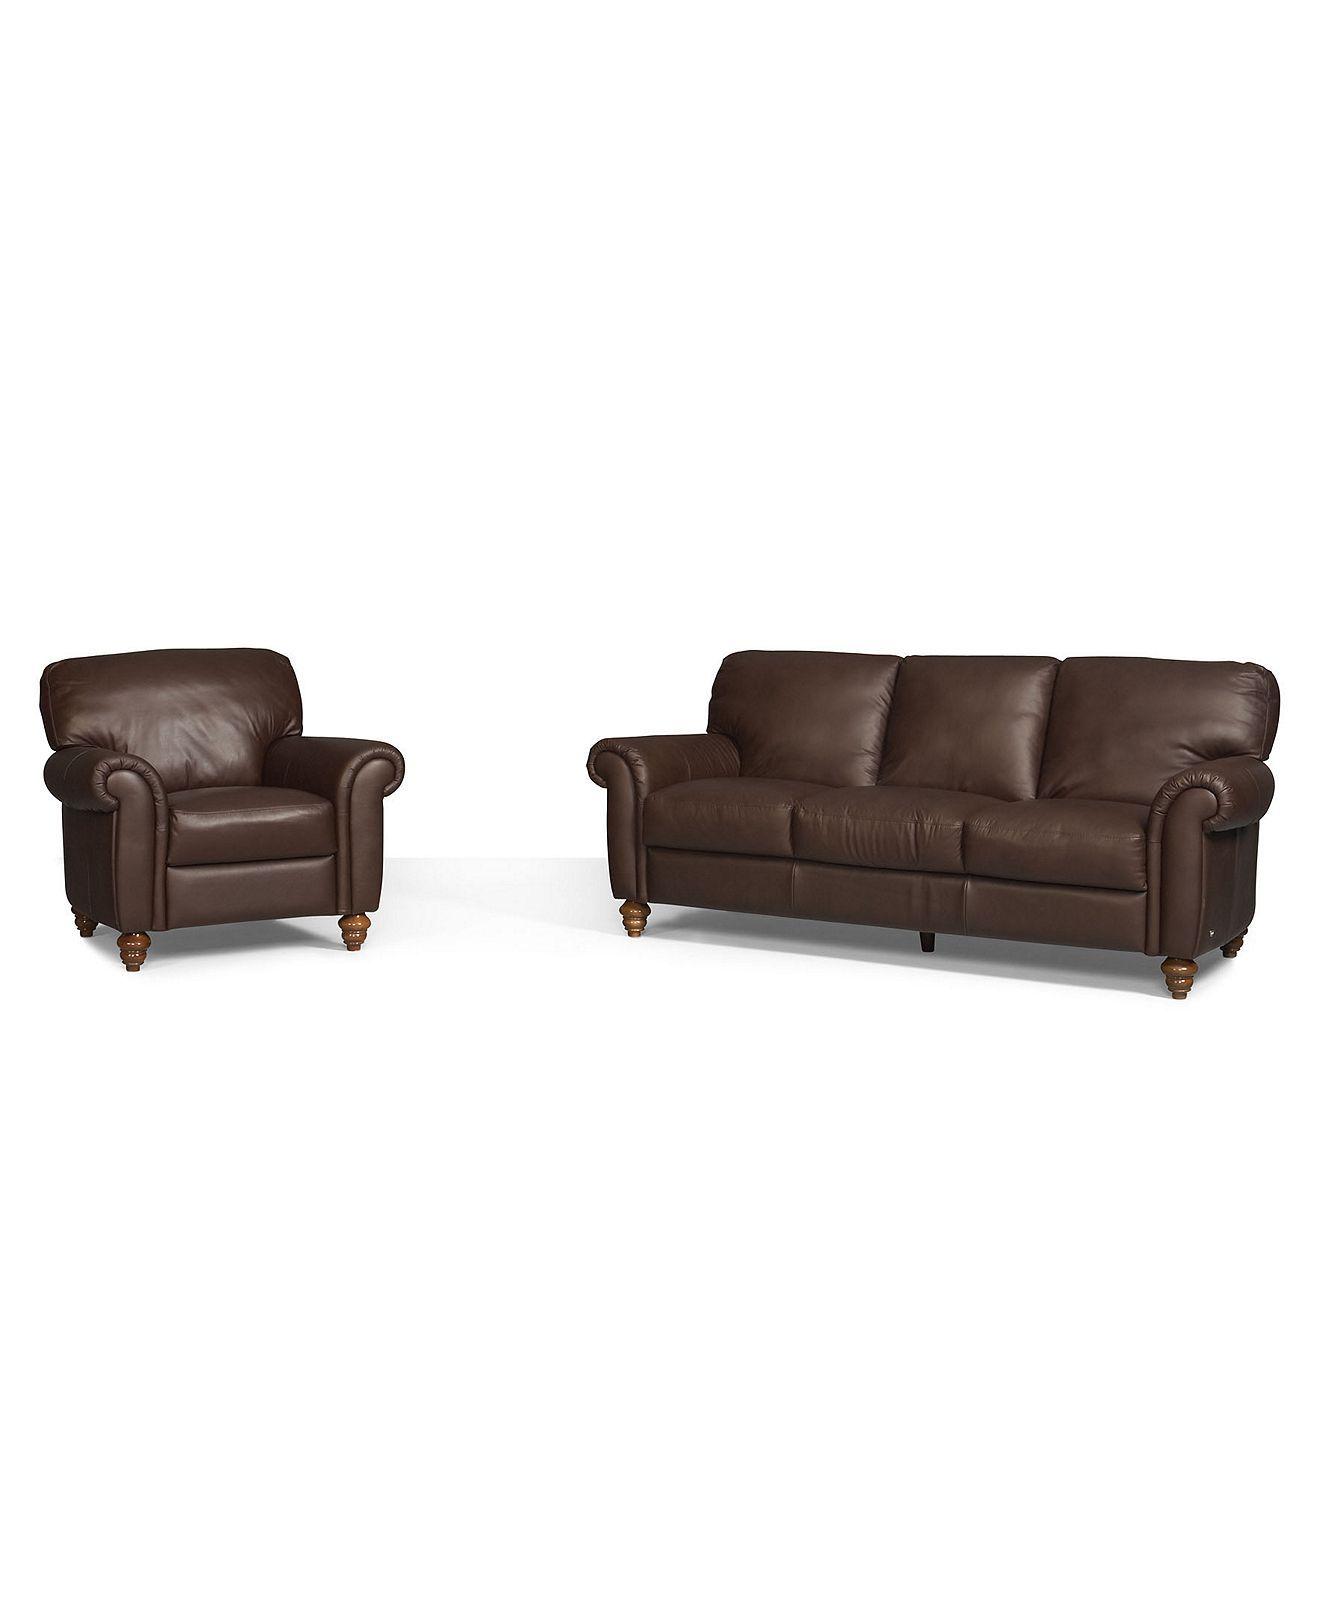 Fine Umbria 2 Piece Leather Sofa Set Sofa And Chair Sofas Theyellowbook Wood Chair Design Ideas Theyellowbookinfo